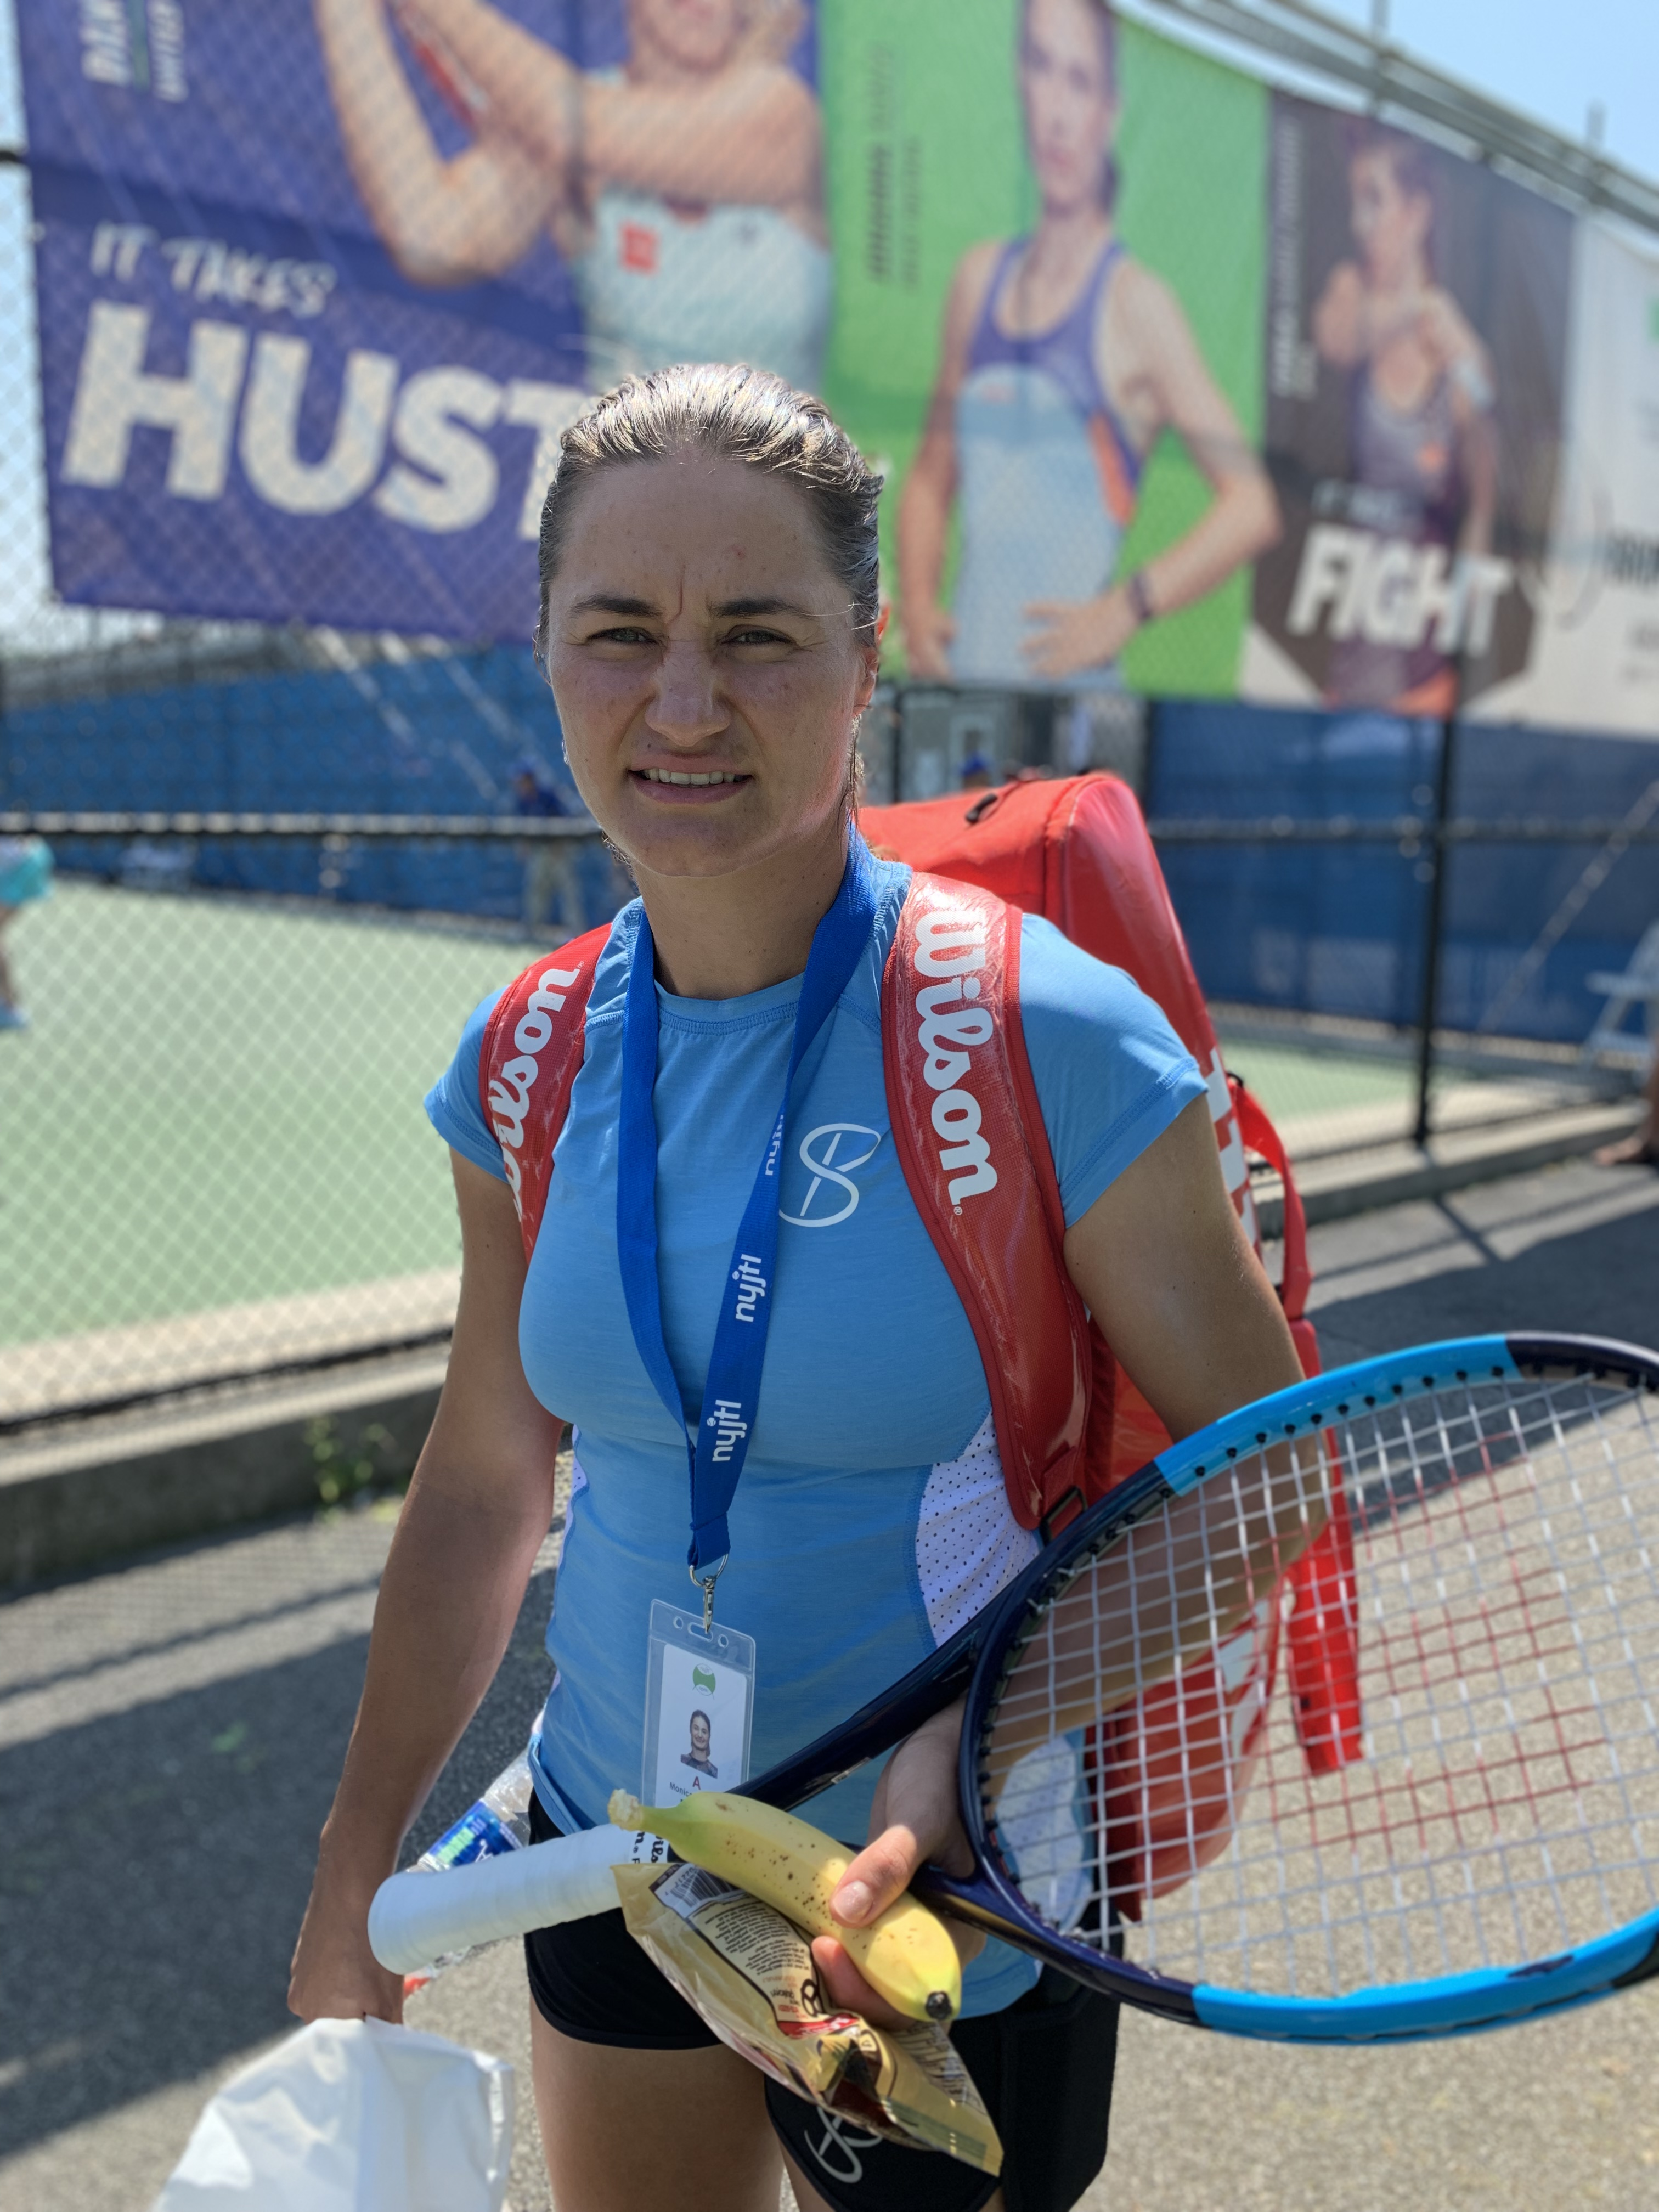 Monica Niculescu, 2019 Bronx Open (Photo: TennisAtlantic.com)